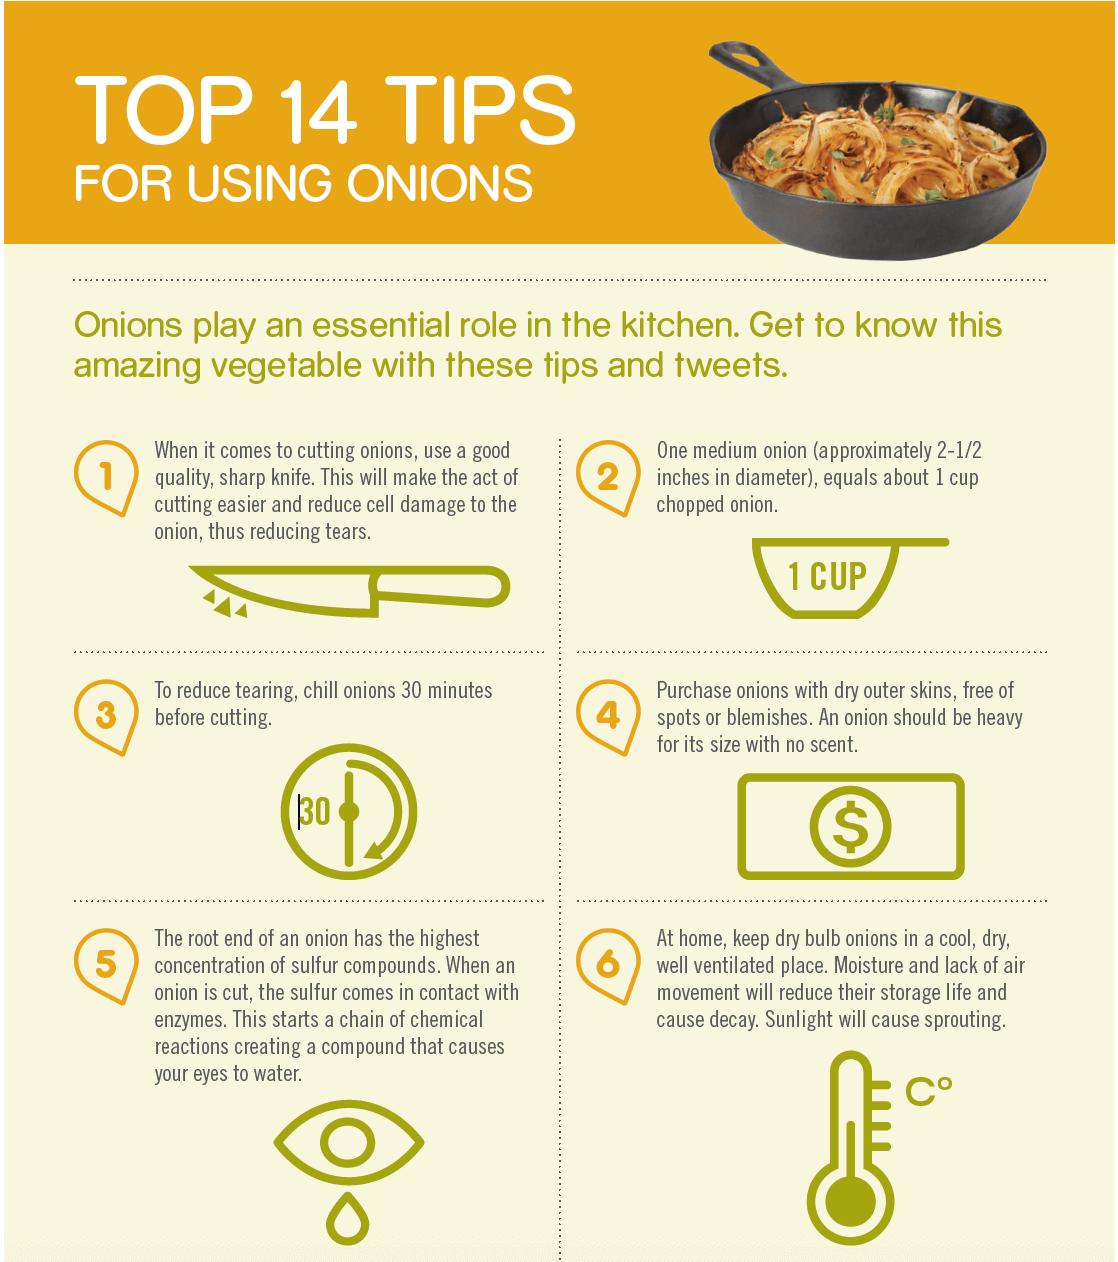 Onion tips